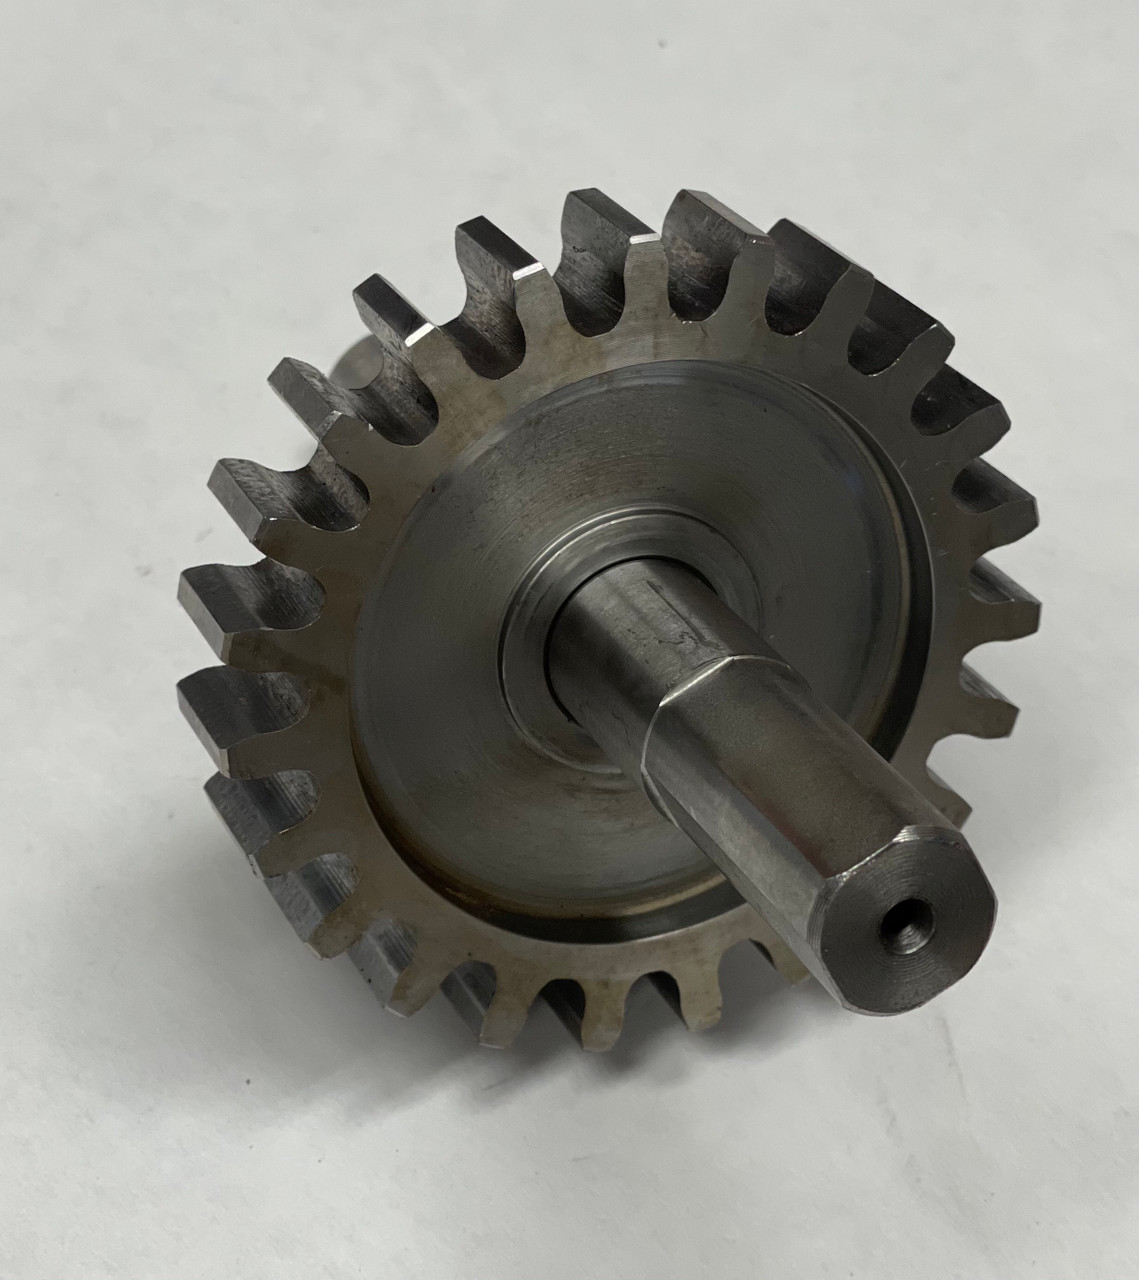 "Sausage Maker - 3 3/4"" Diameter Gear for 25lb Sausage Stuffer"